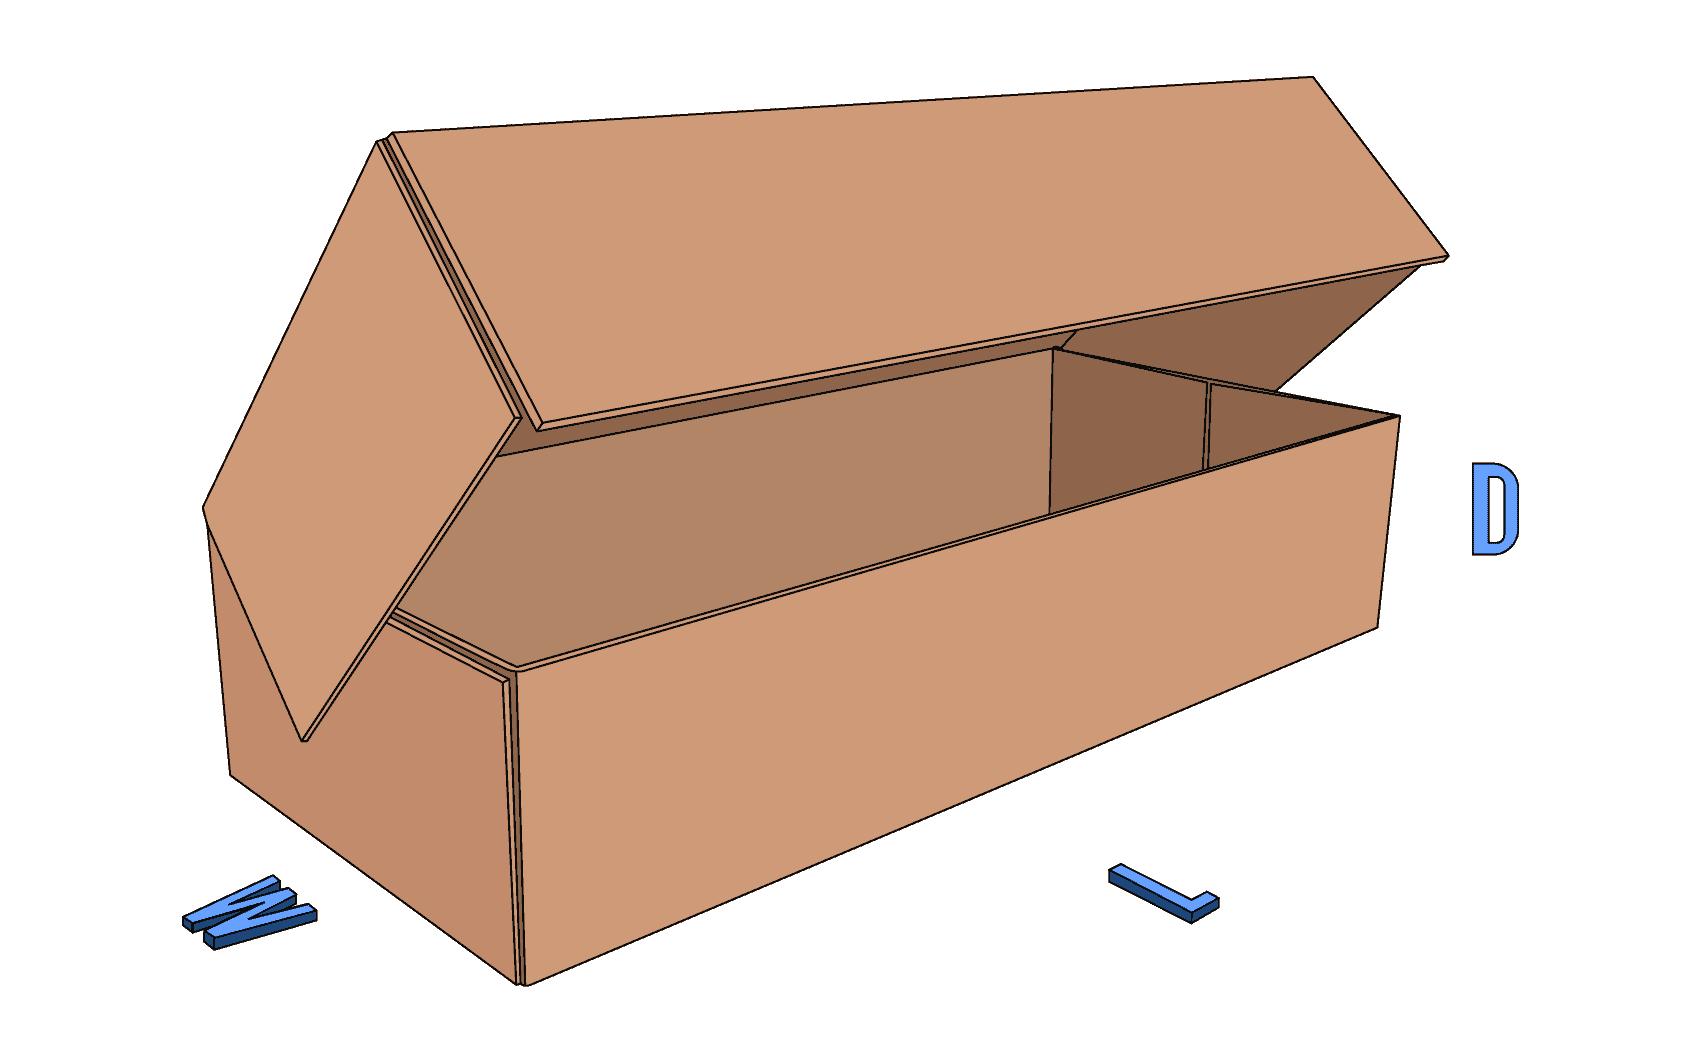 5 Panel Folder (5PF) box style